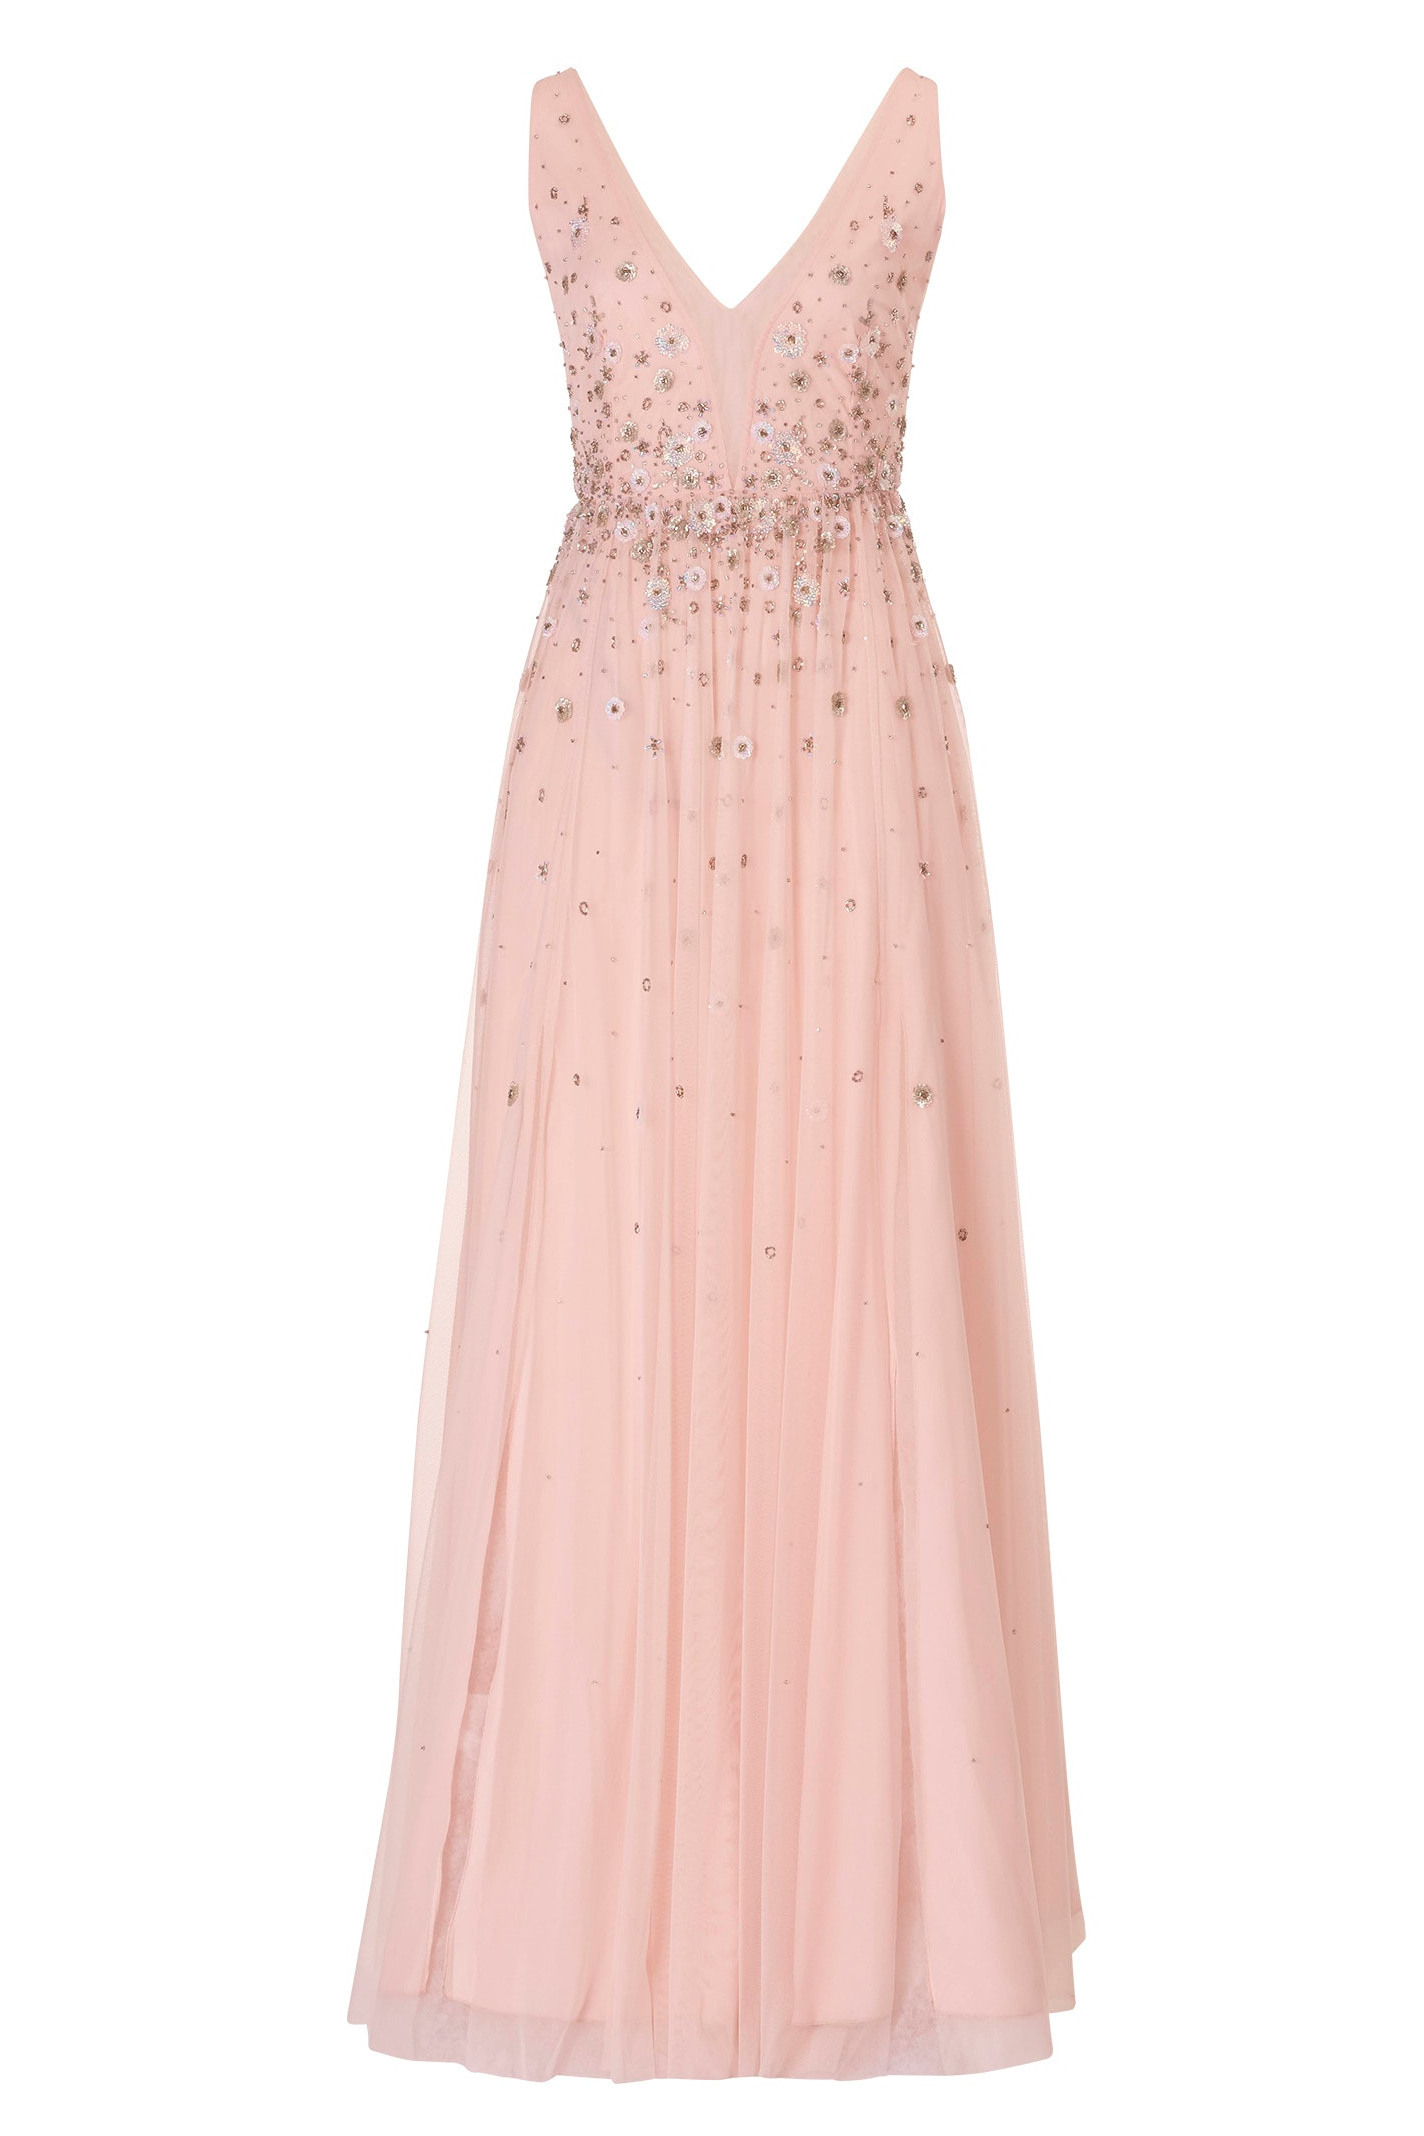 17 Spektakulär Abendkleid Rosa Lang Galerie17 Erstaunlich Abendkleid Rosa Lang Boutique